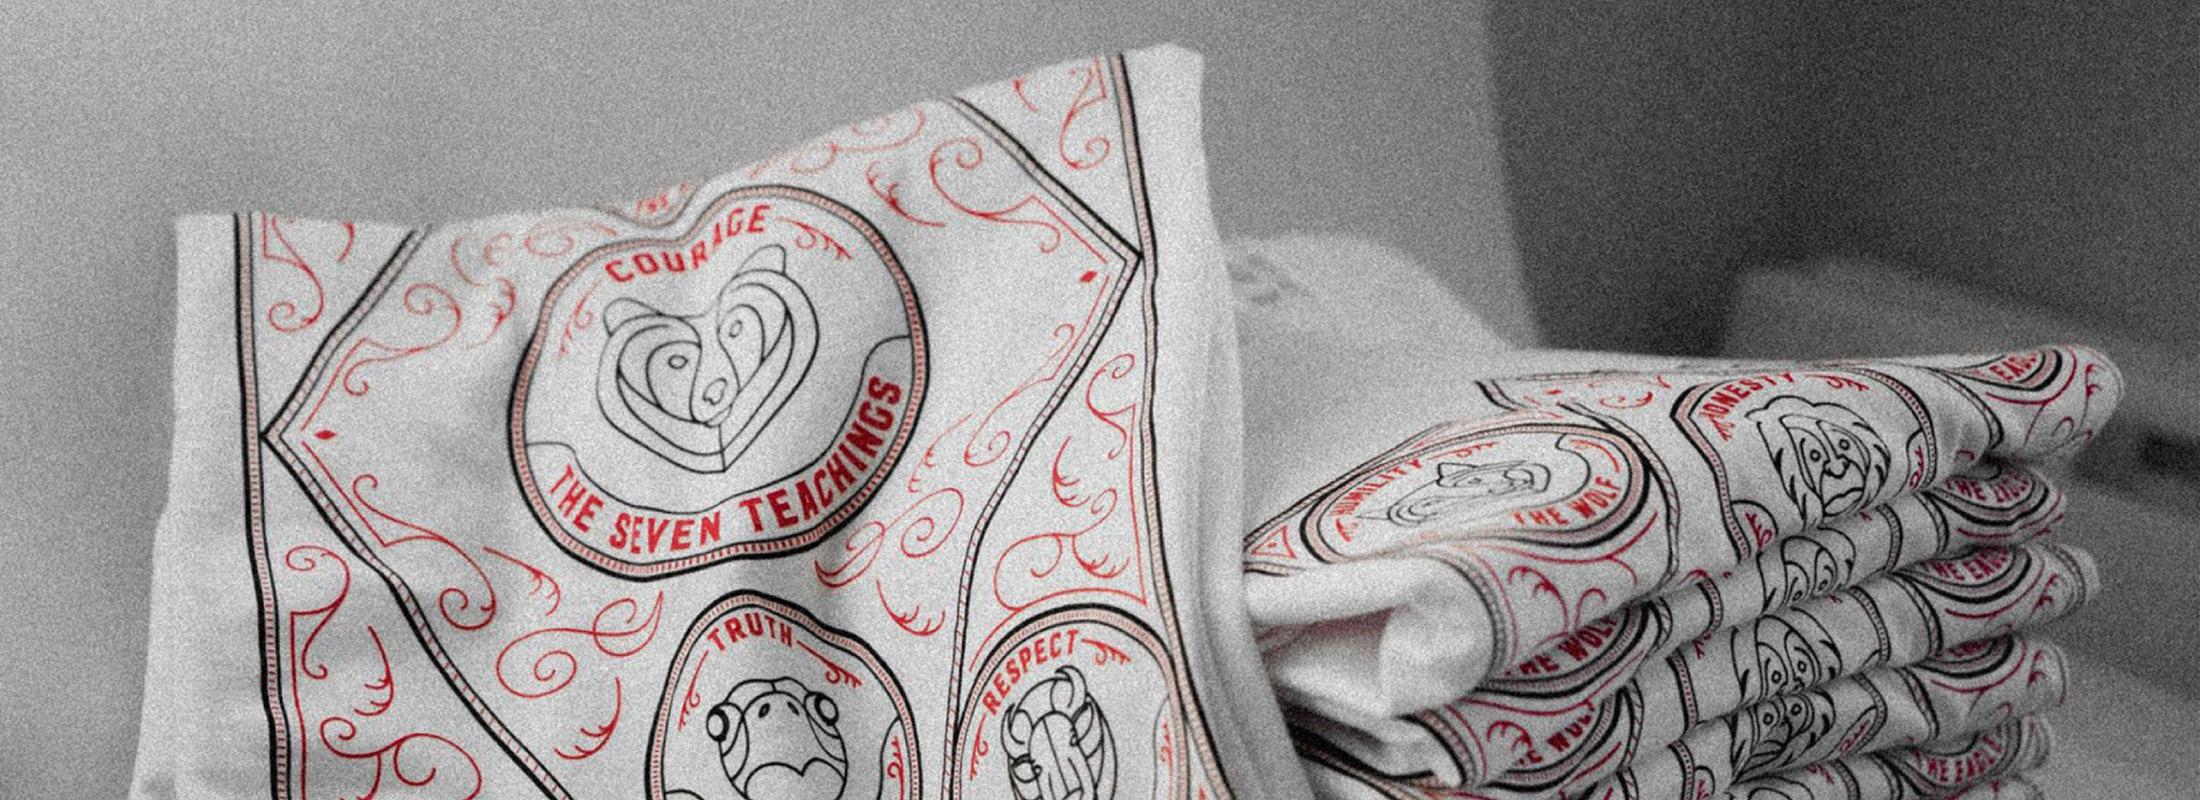 Thred Design Co. | The Seven Teachings t-shirt design